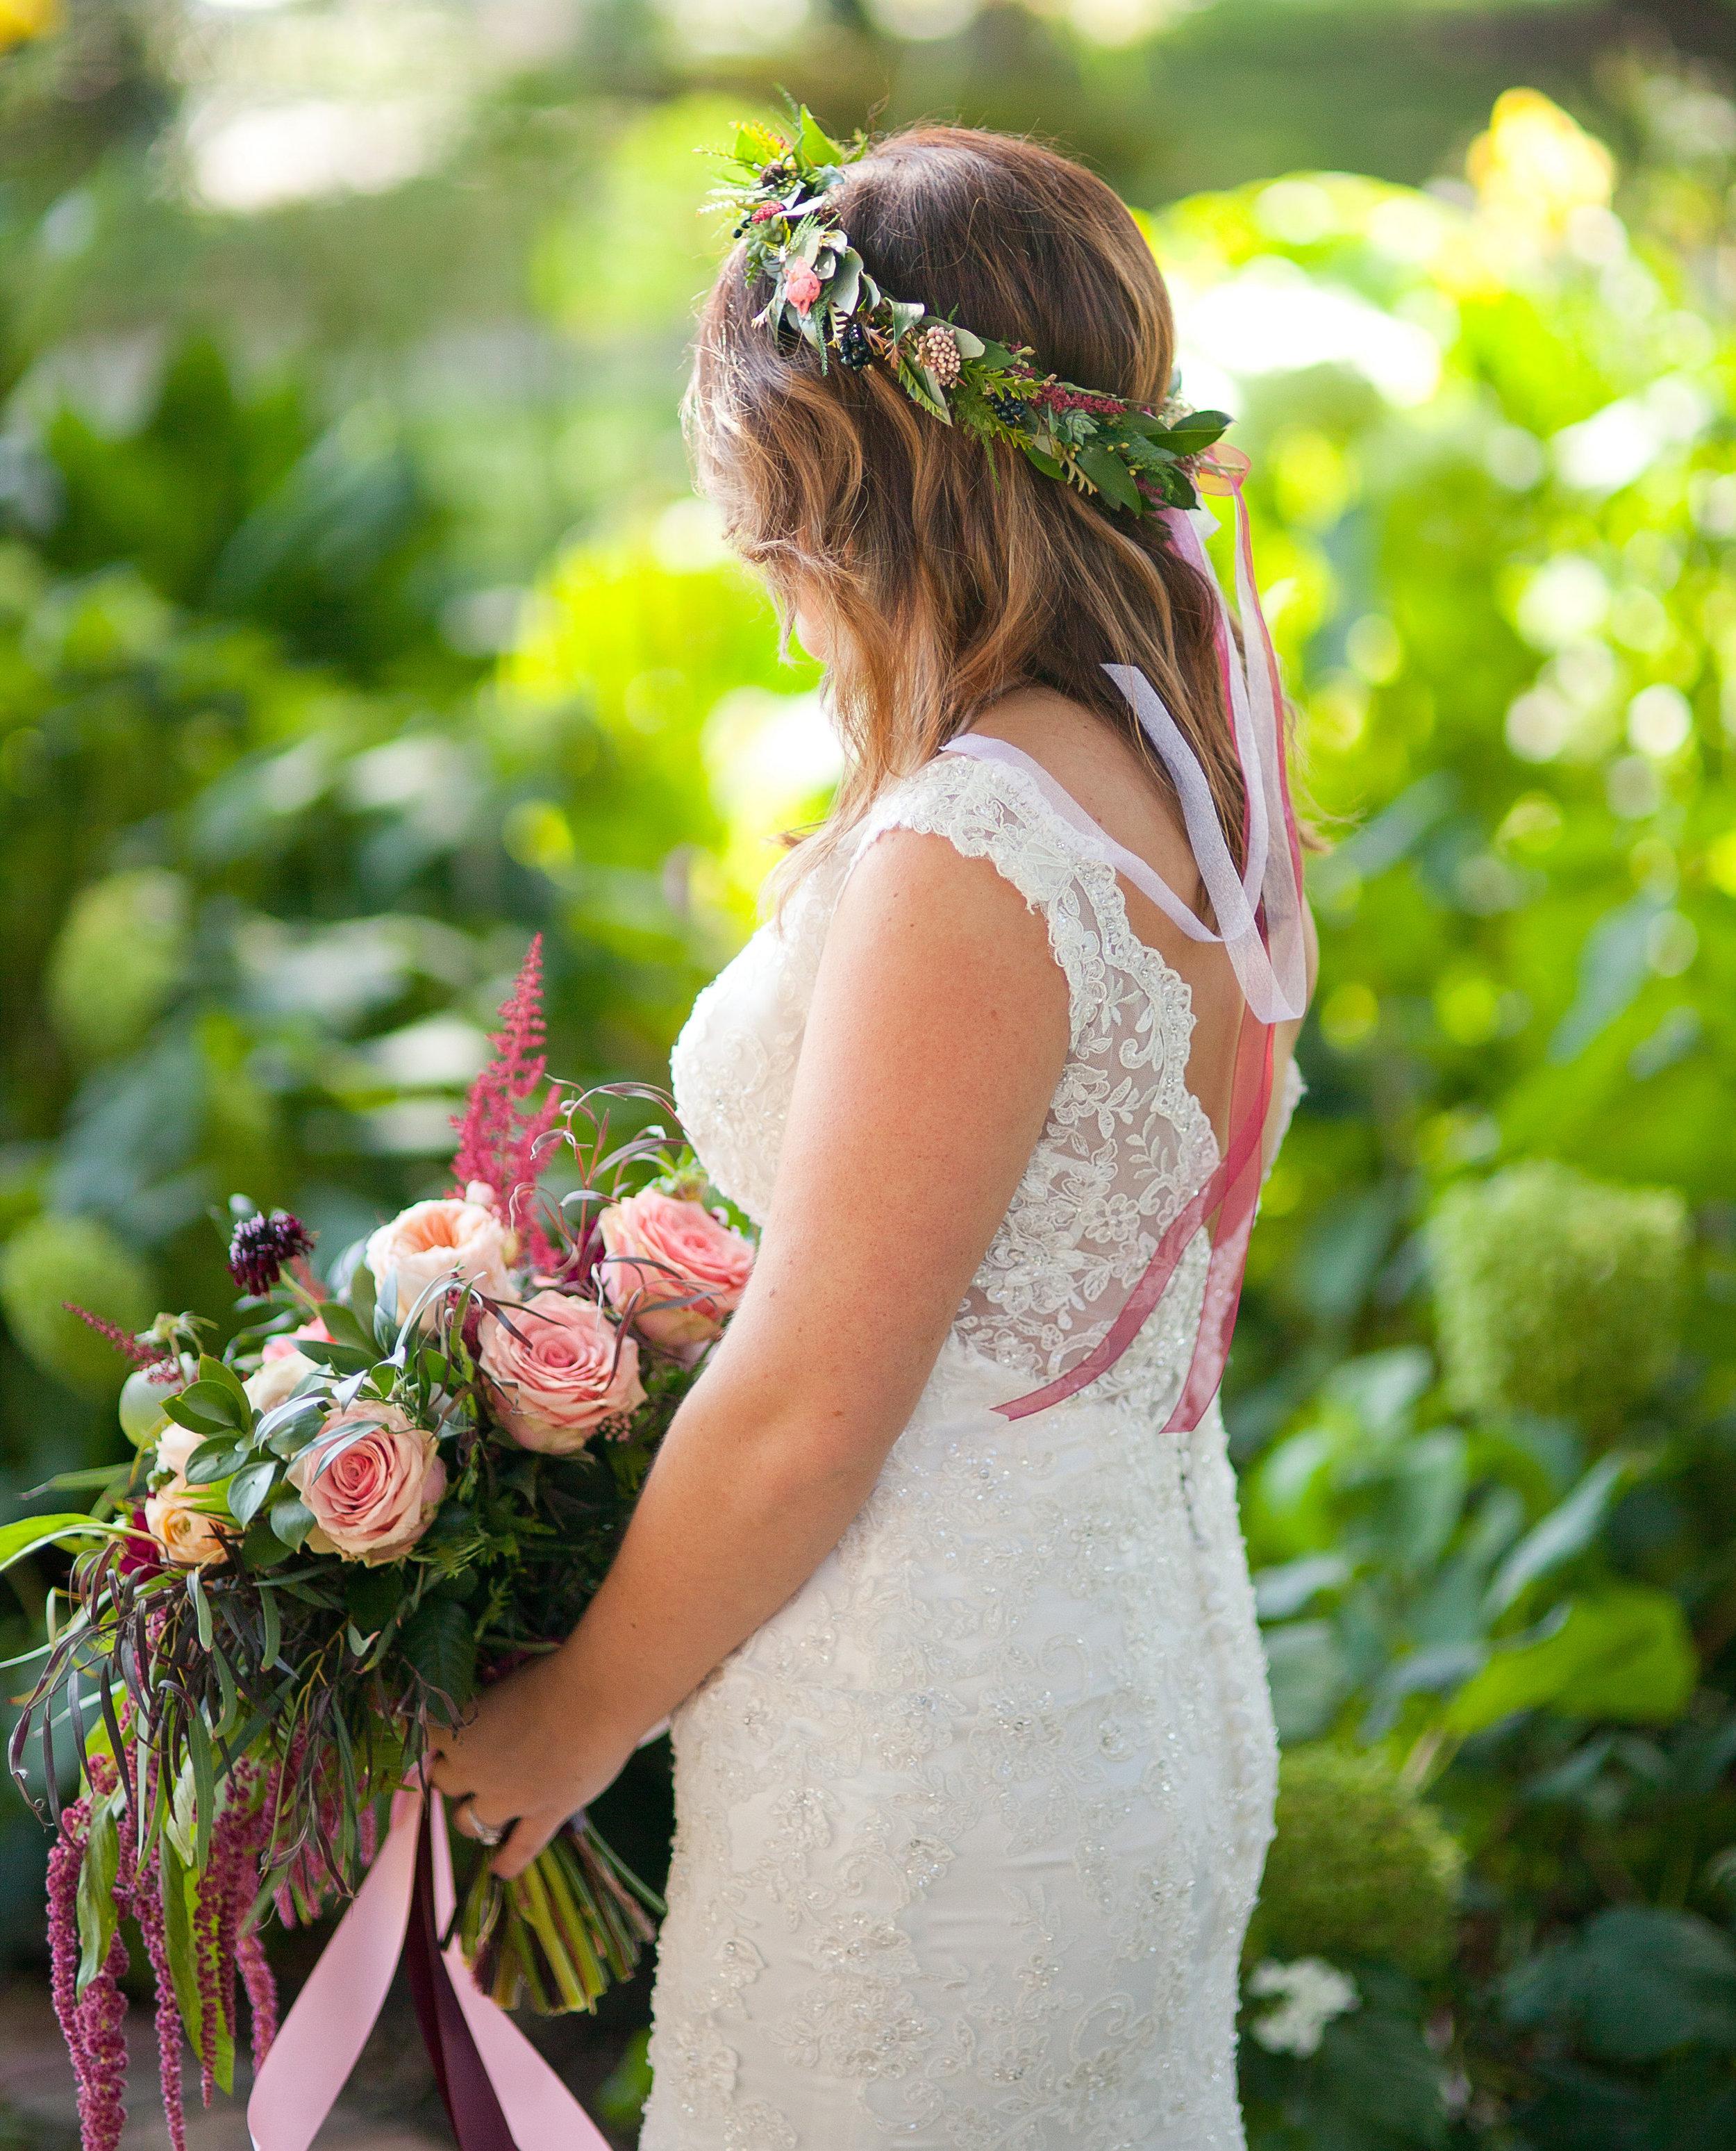 www.facebook.com/meganrochellephotography/